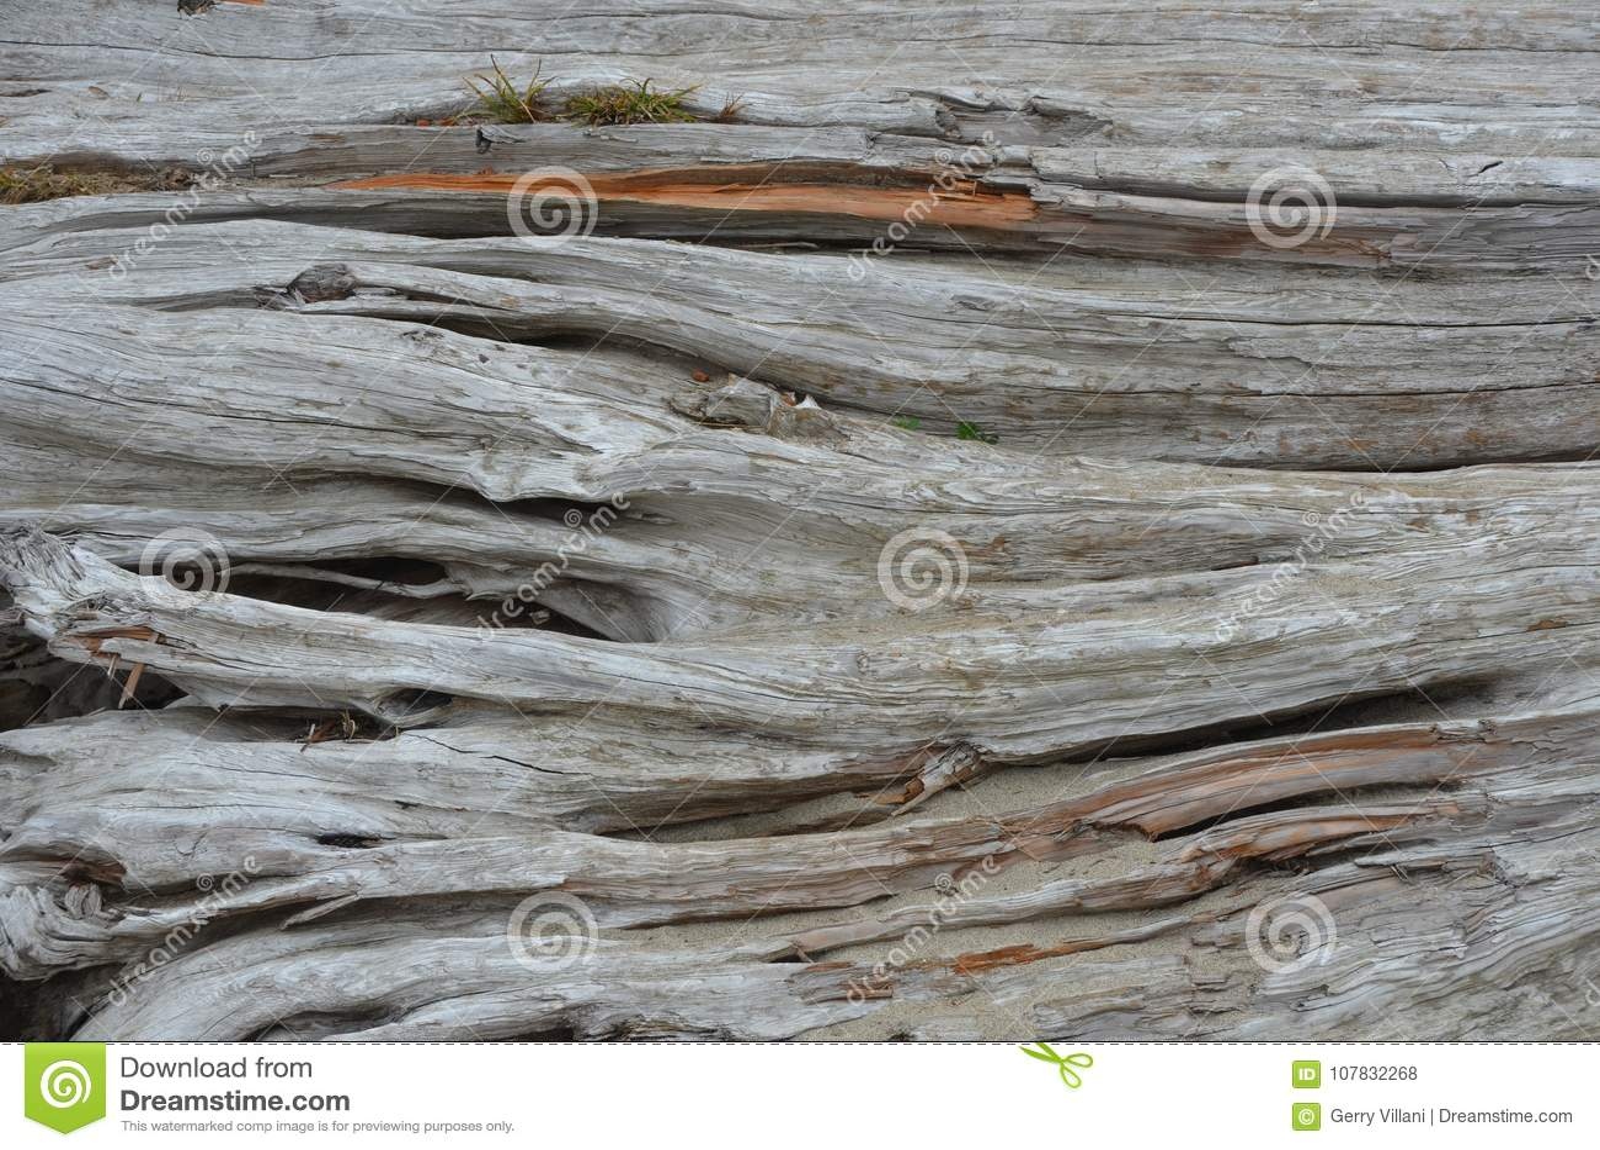 Drift wood log detail at an Oregon beach 1